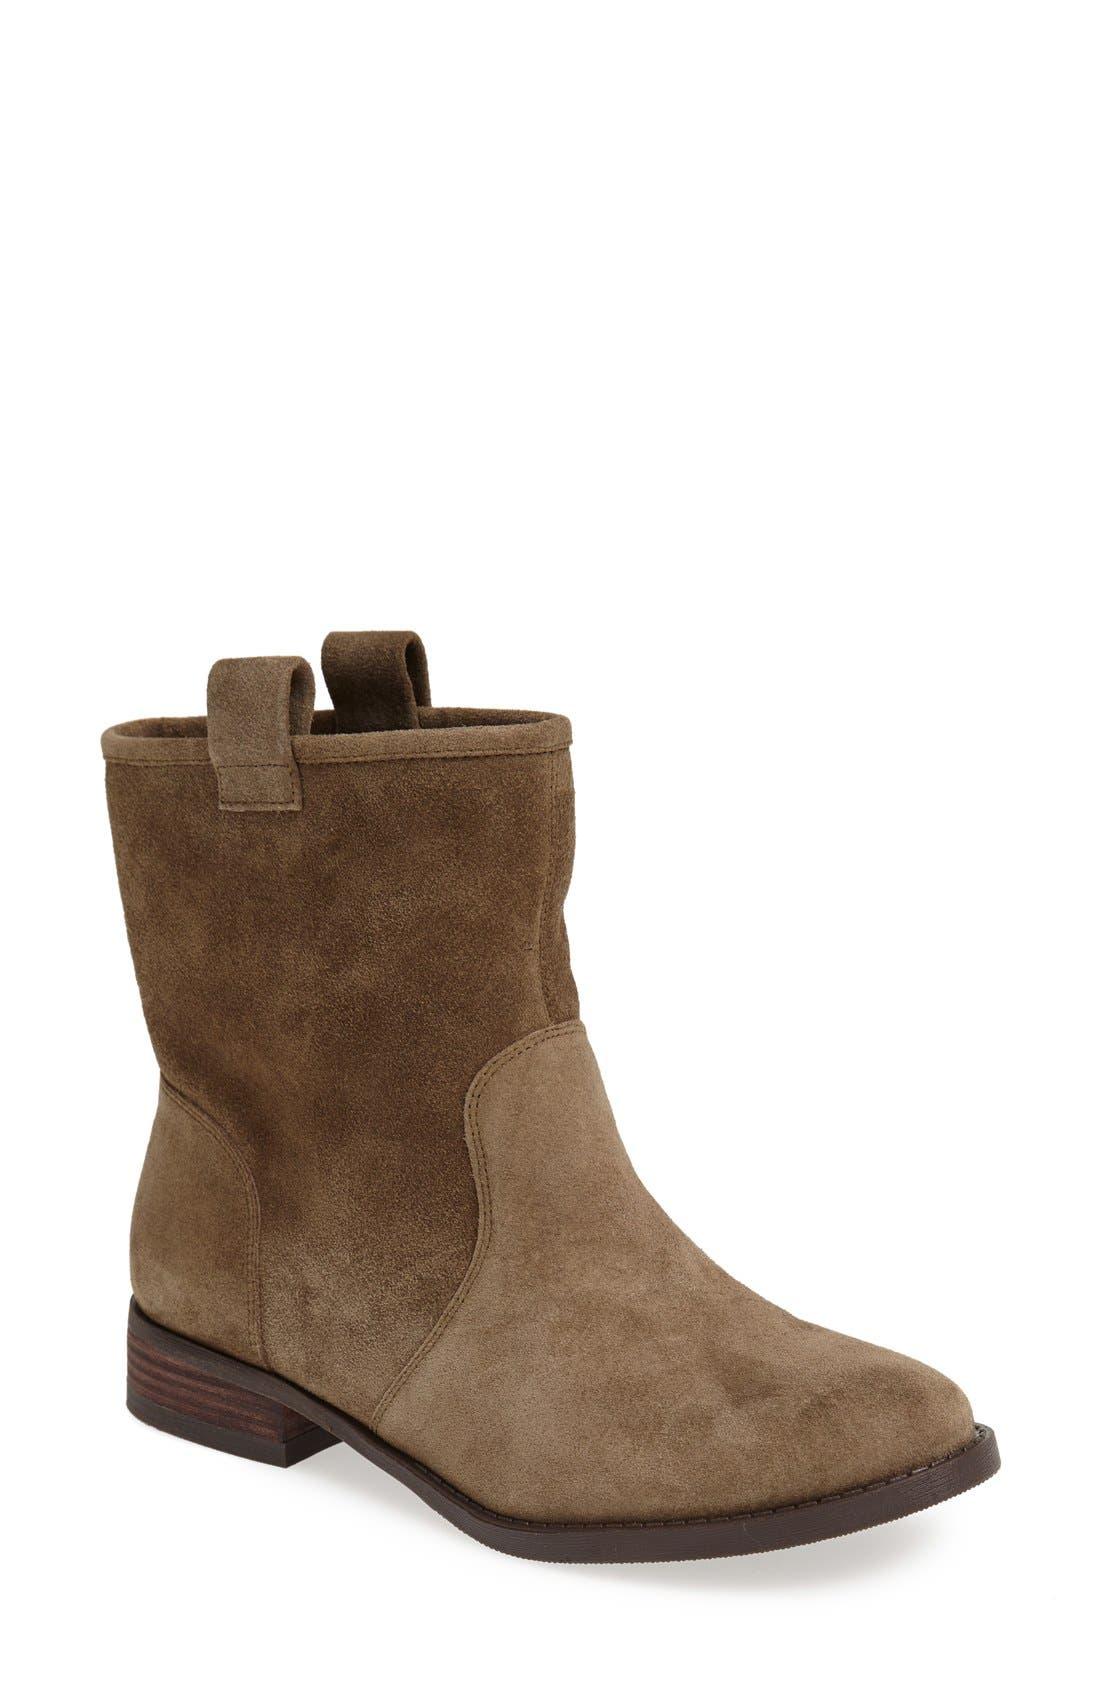 Main Image - Sole Society 'Natasha' Boot (Women)